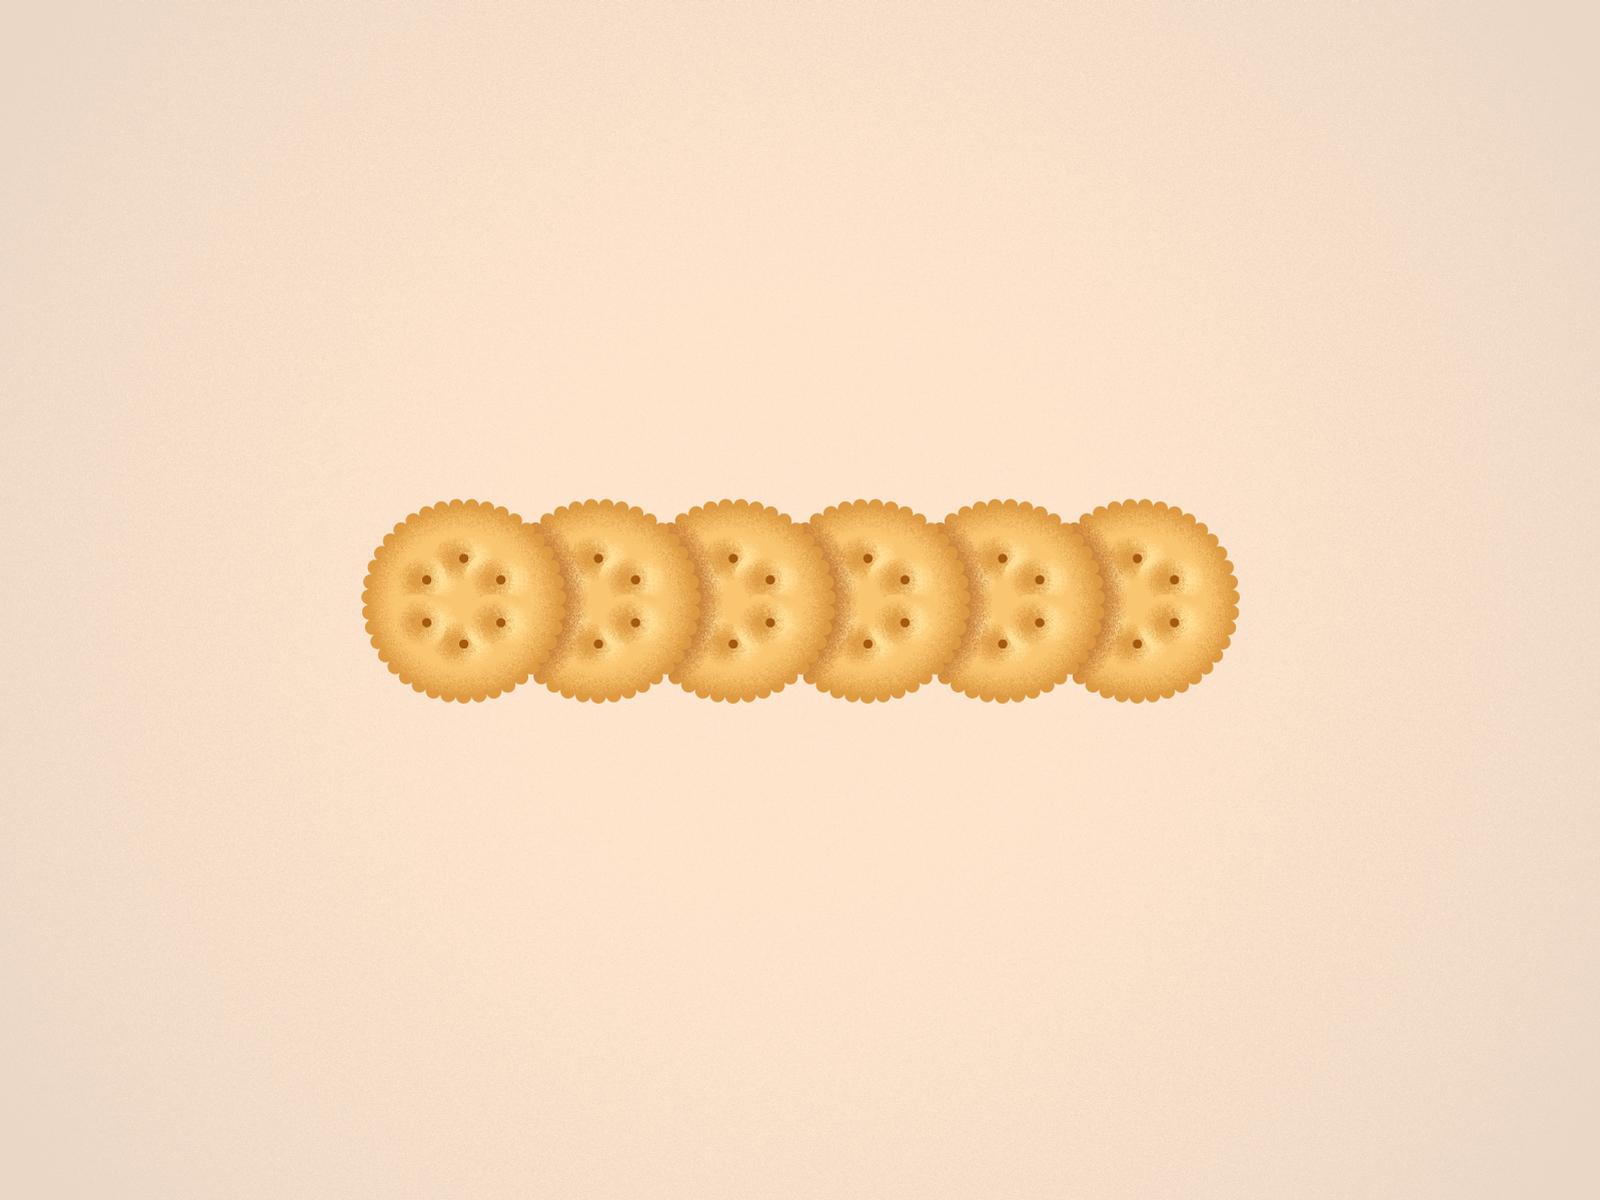 Seinfeld 3 singles ritz crackers